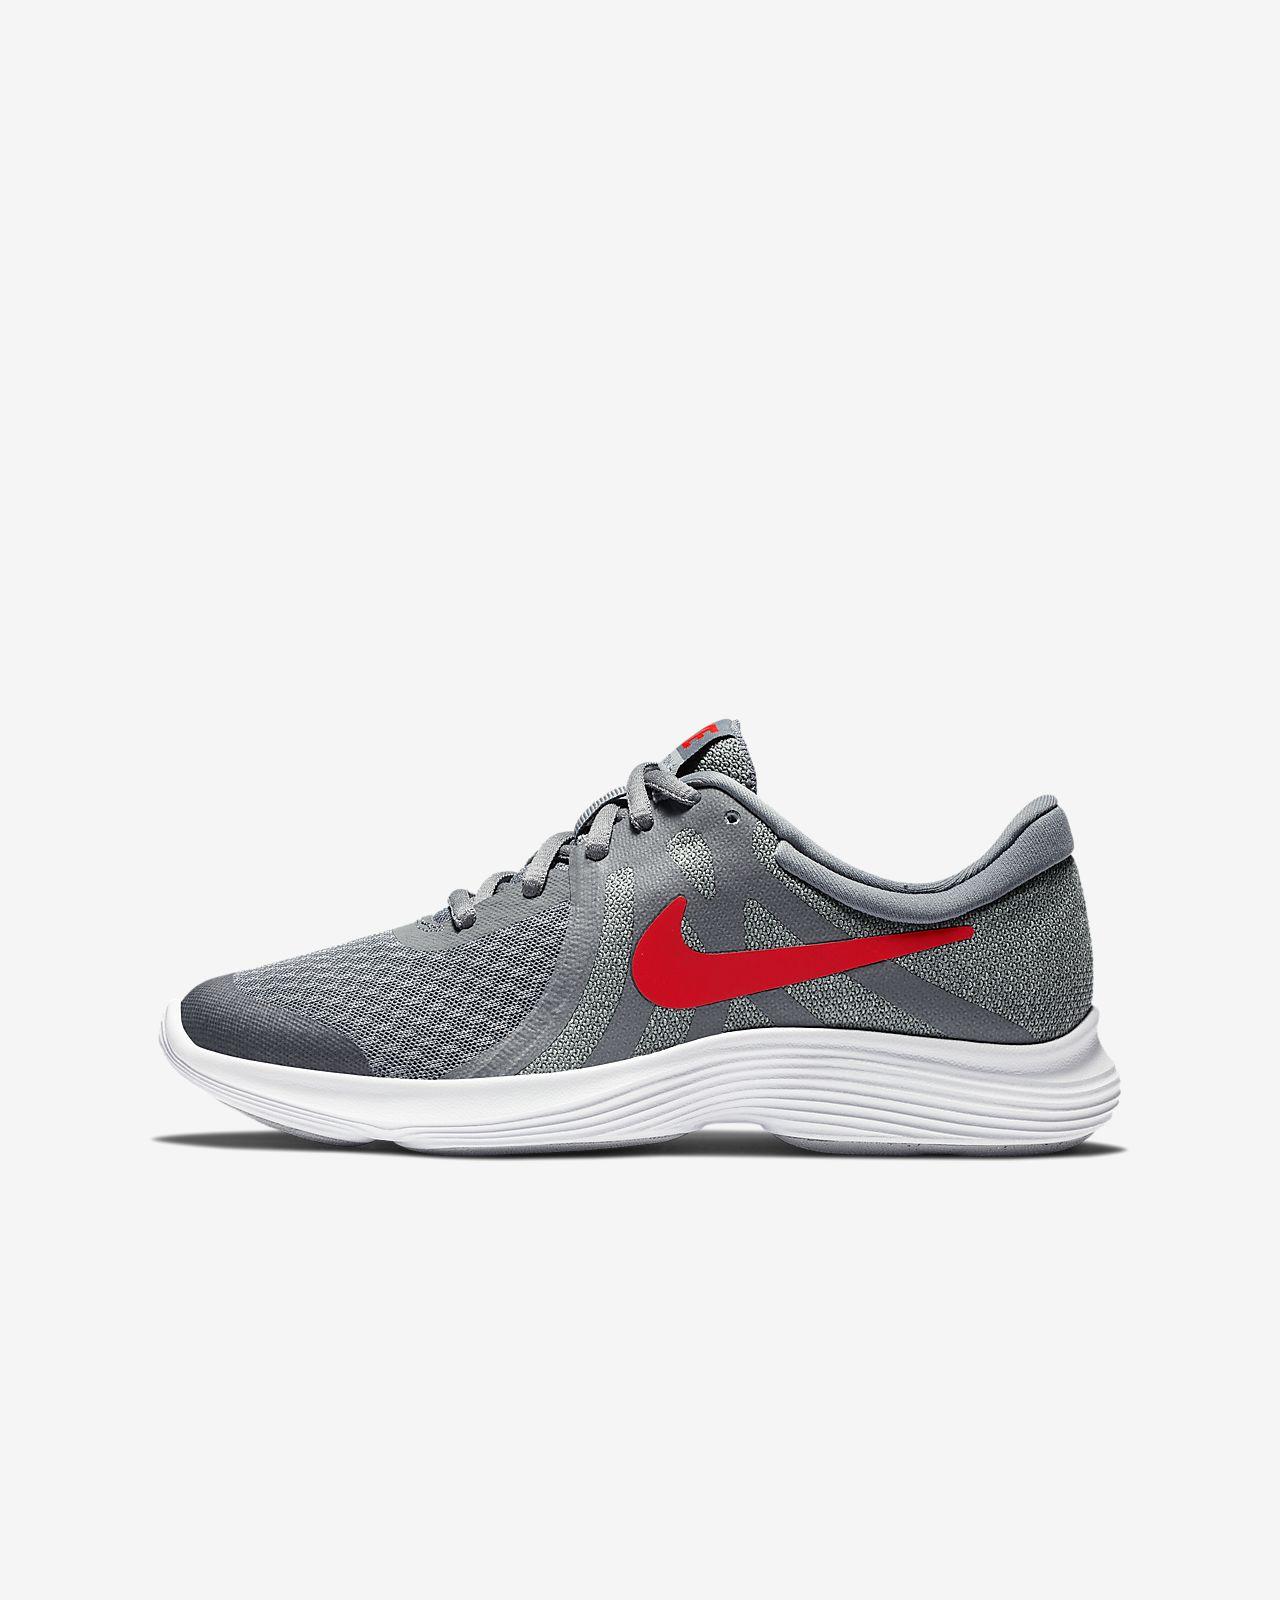 Calzado de running para niños talla grande Nike Revolution 4